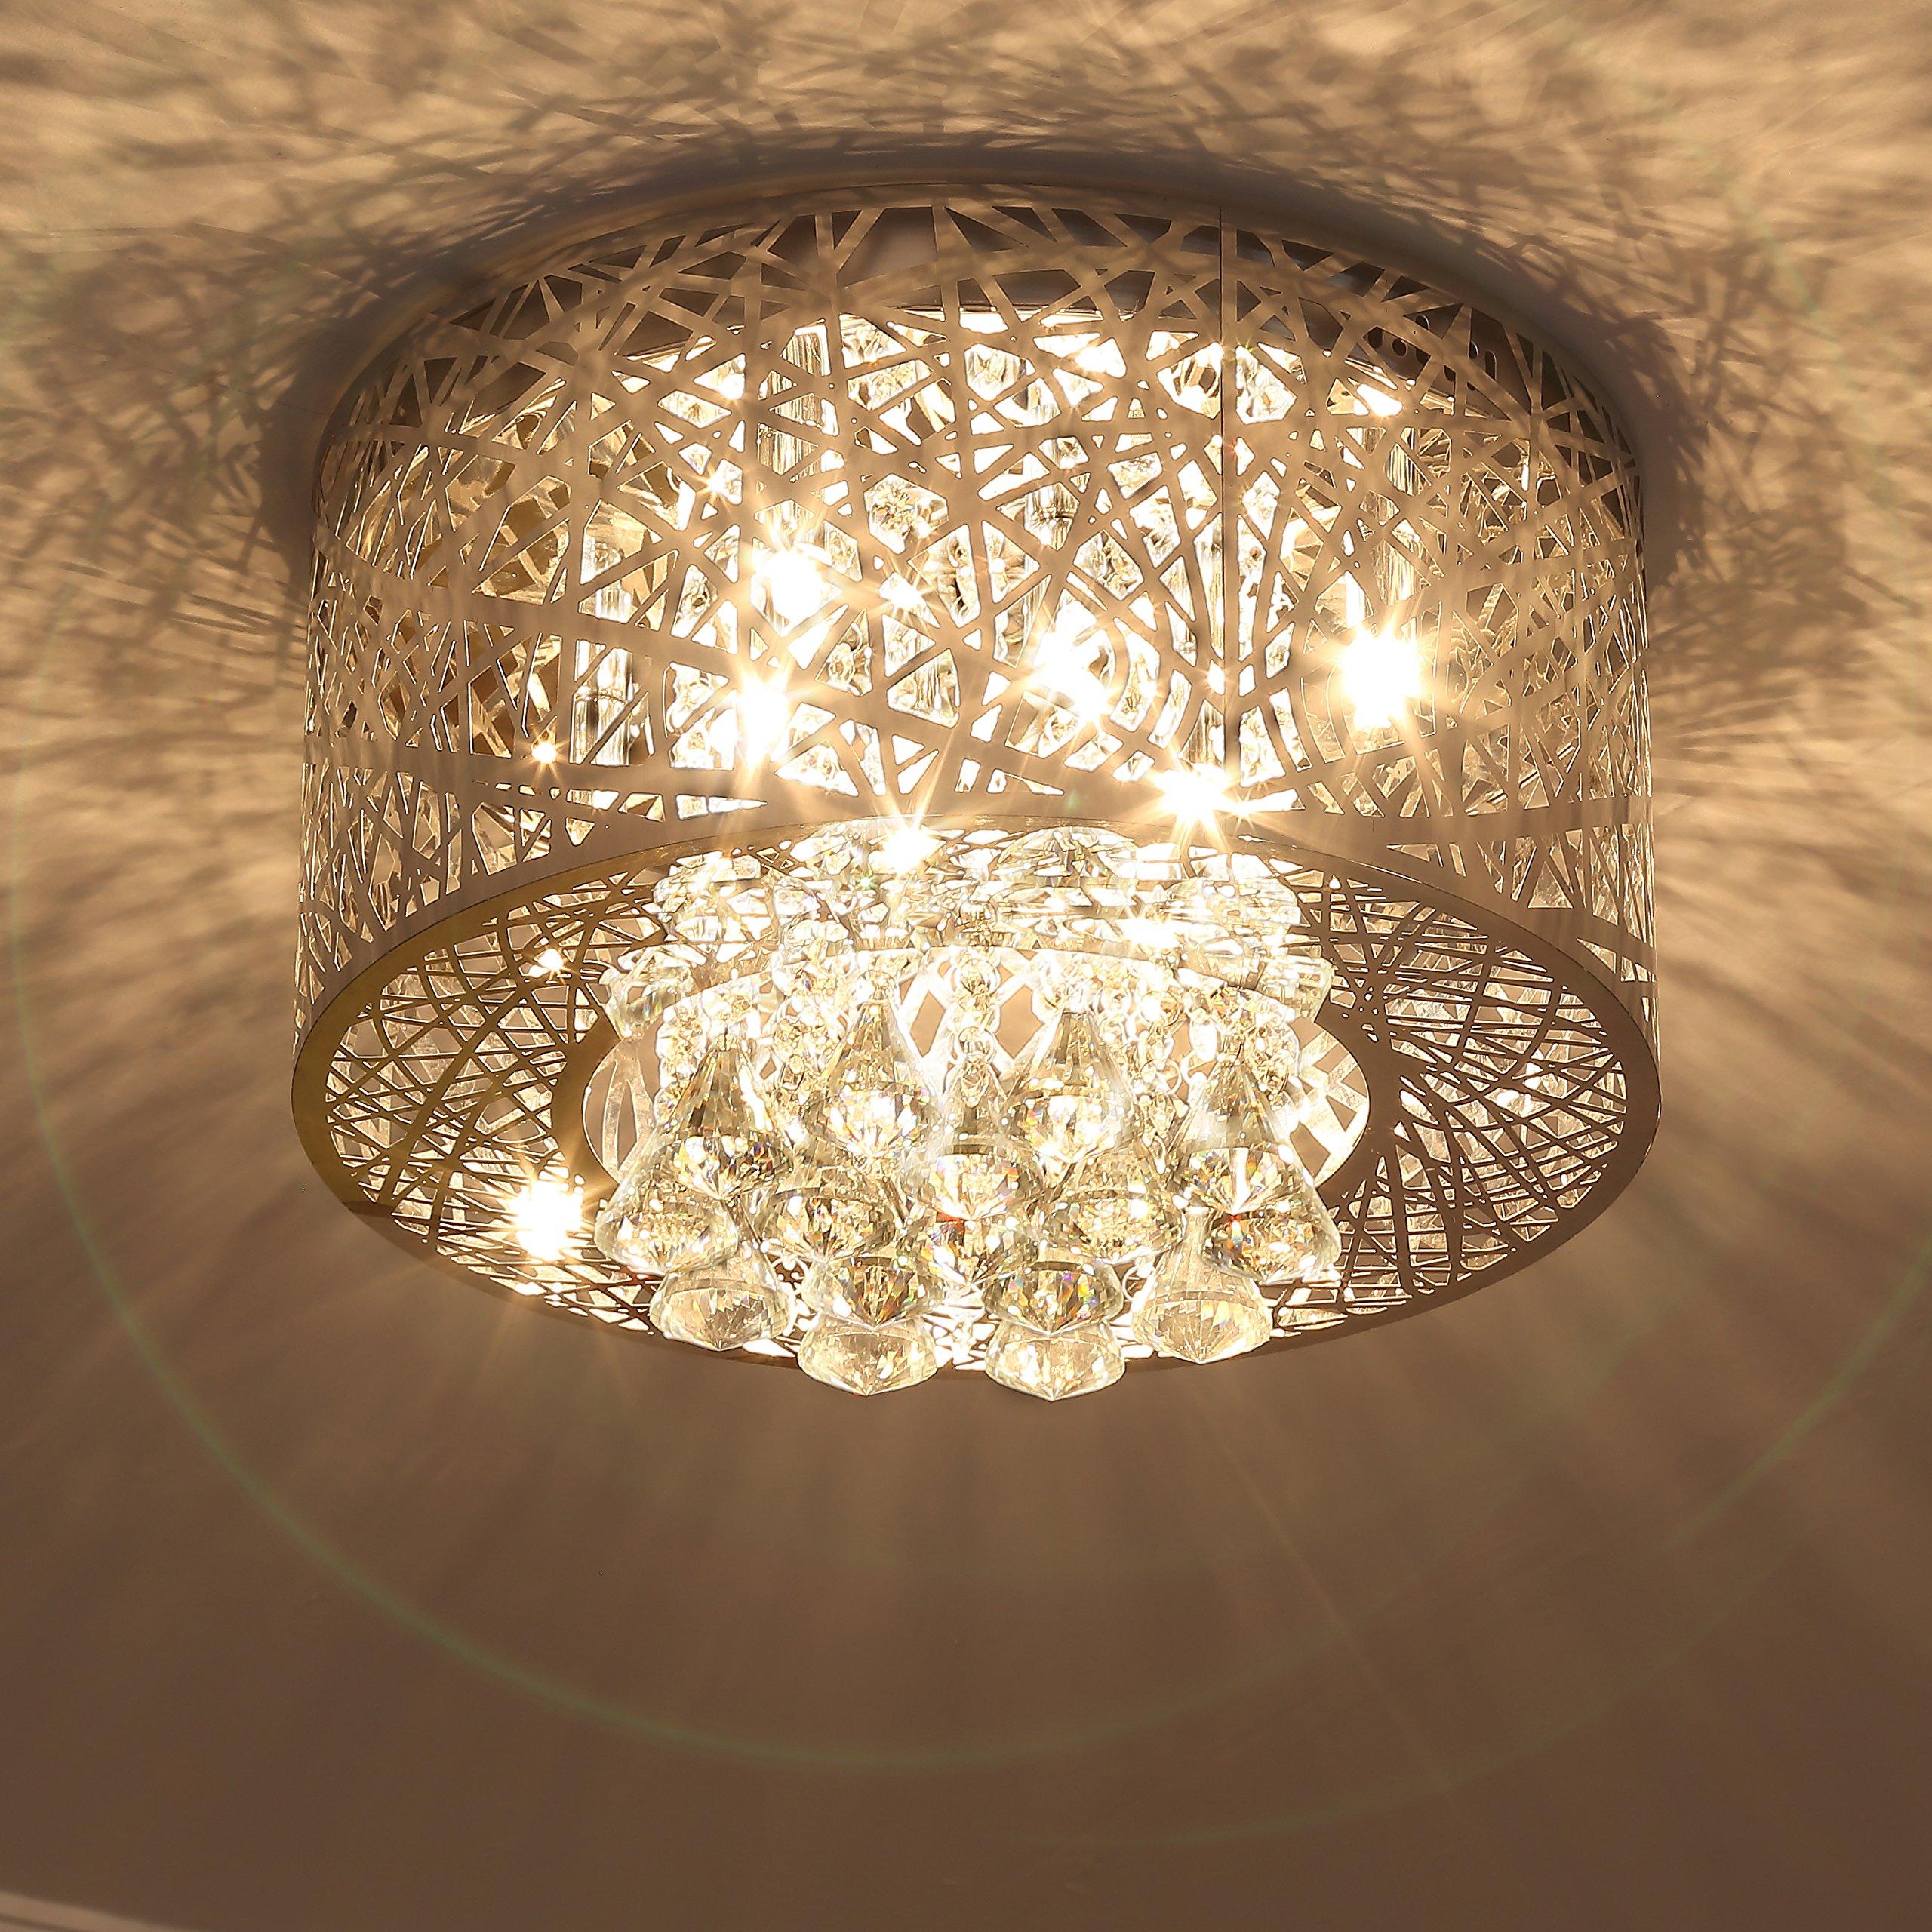 Saint Mossi Modern K9 Crystal Raindrop Chandelier Lighting Flush Mount Led Ceiling Light Fixture Pendant Lamp For Dining Room Bathroom Bedroom Livingroom 8